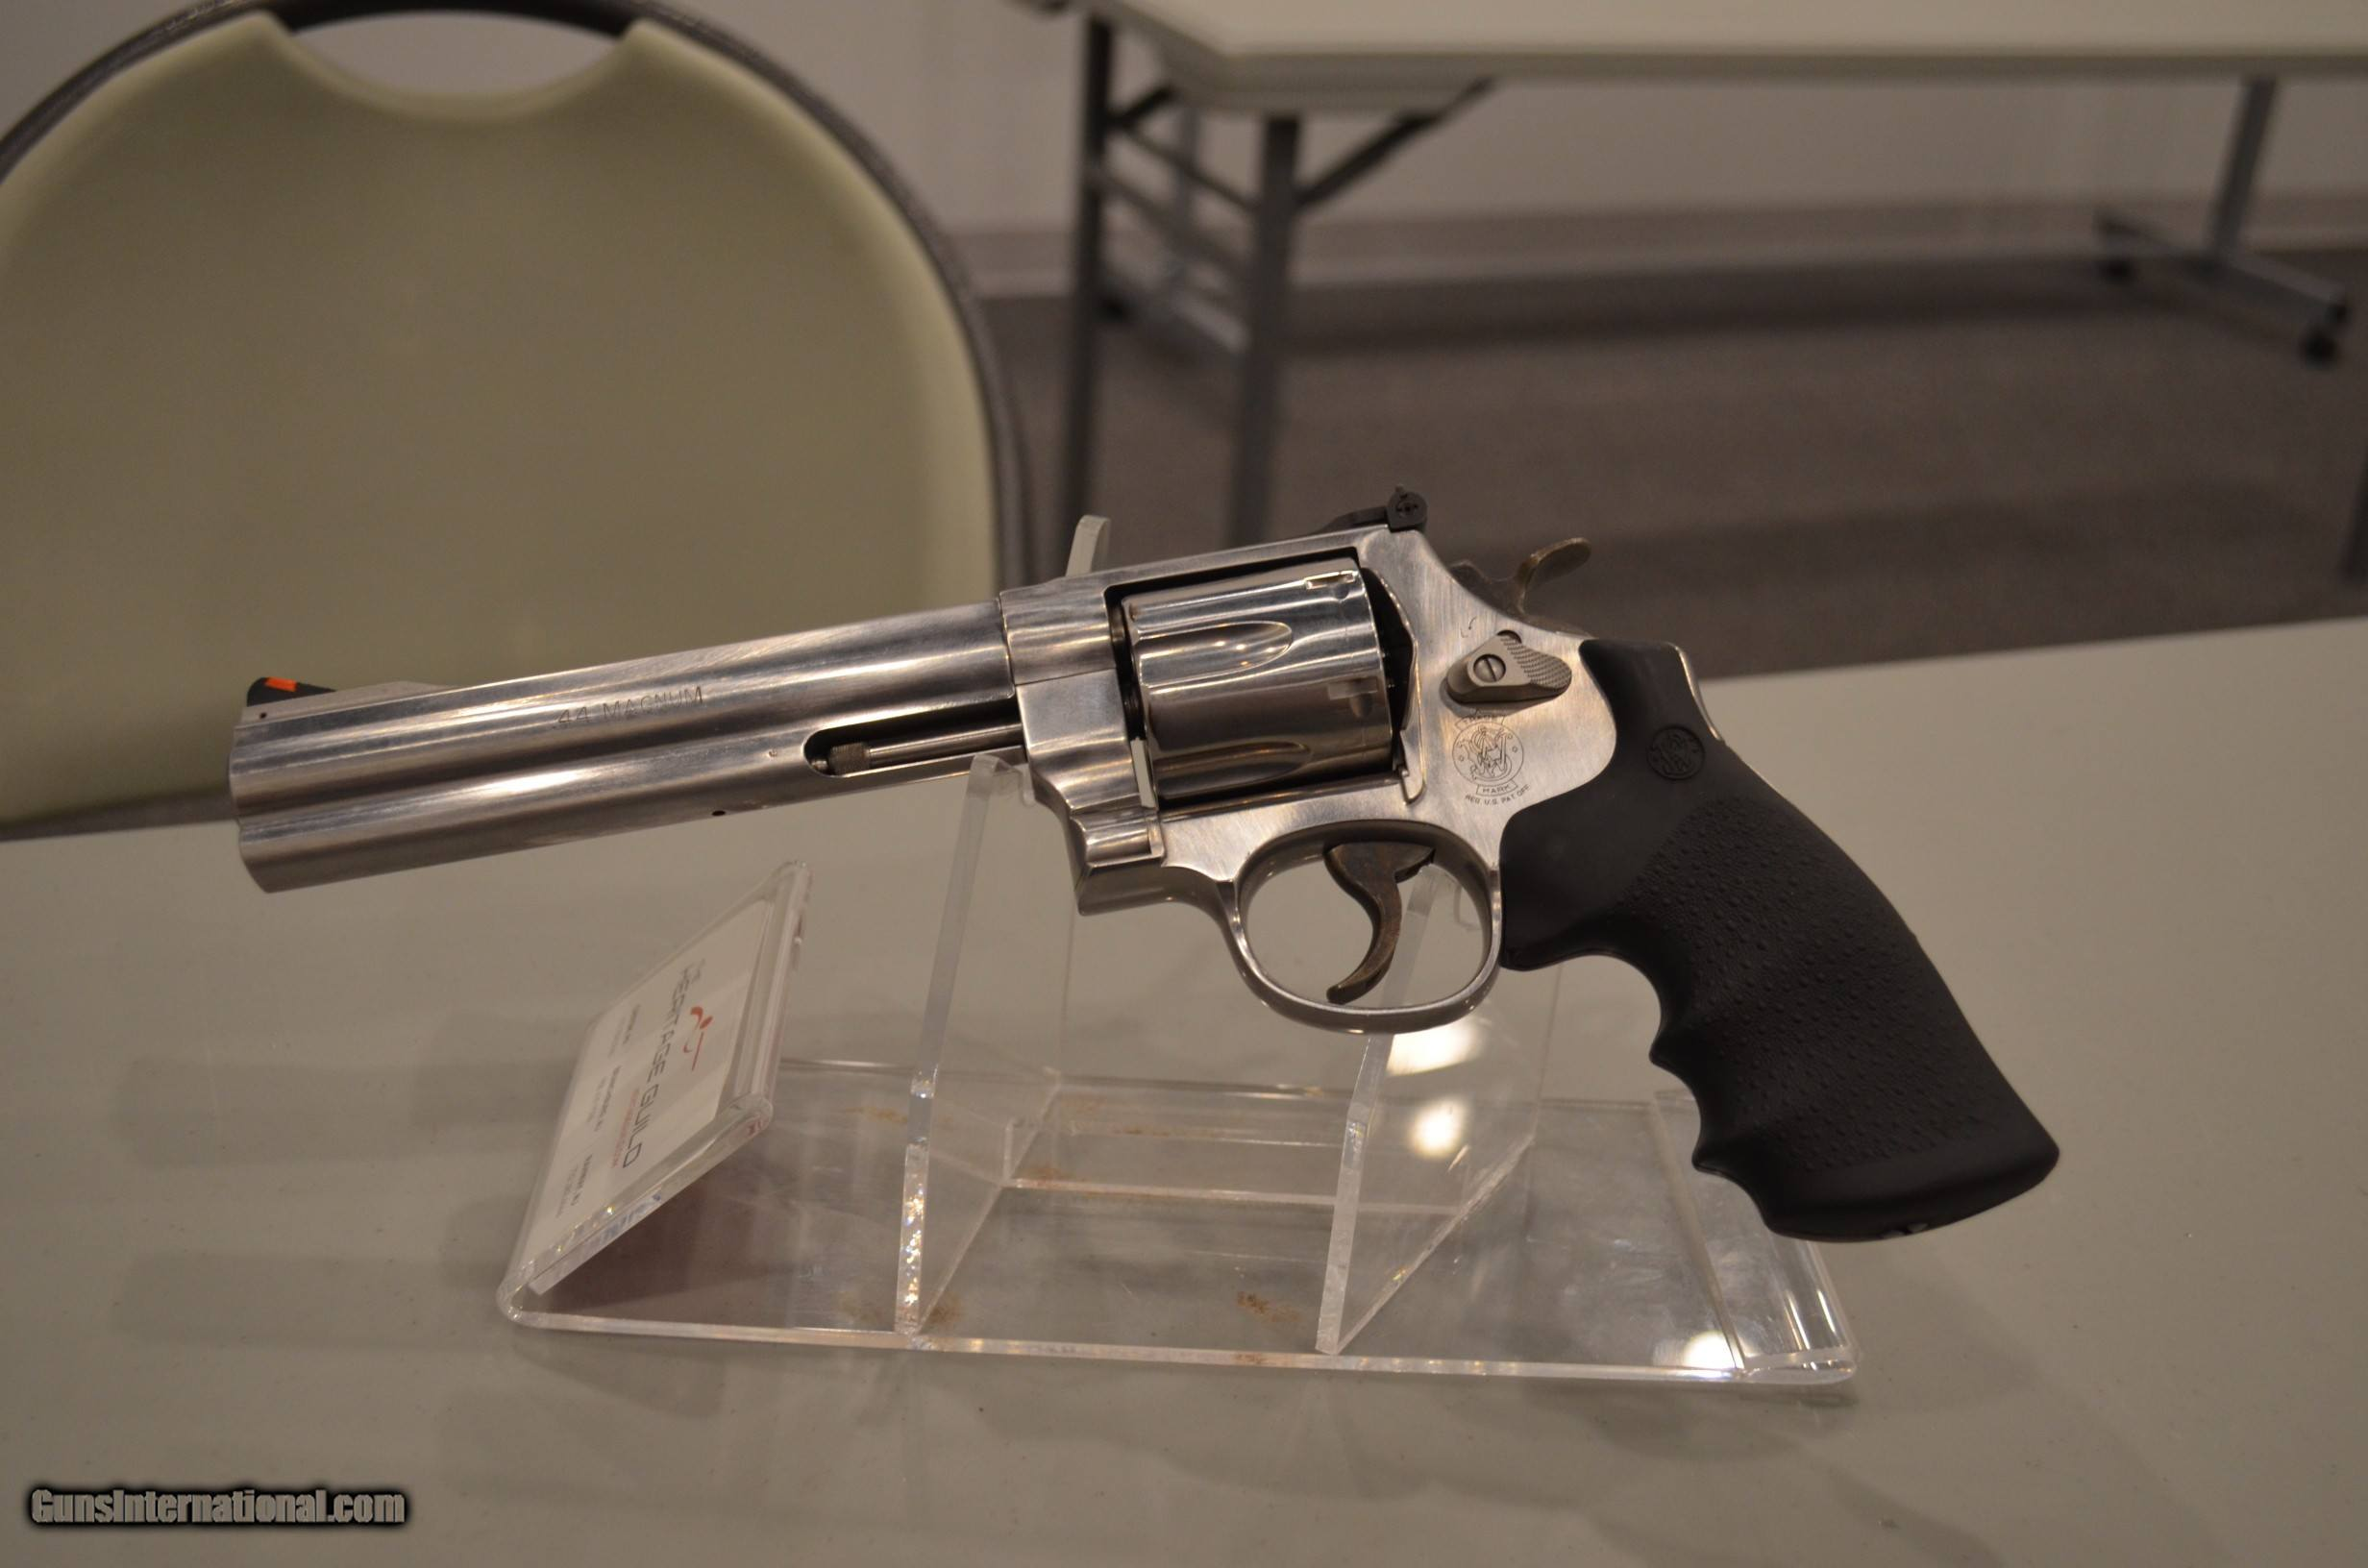 Rose Glen North Dakota ⁓ Try These S&w (smith & Wesson) 629